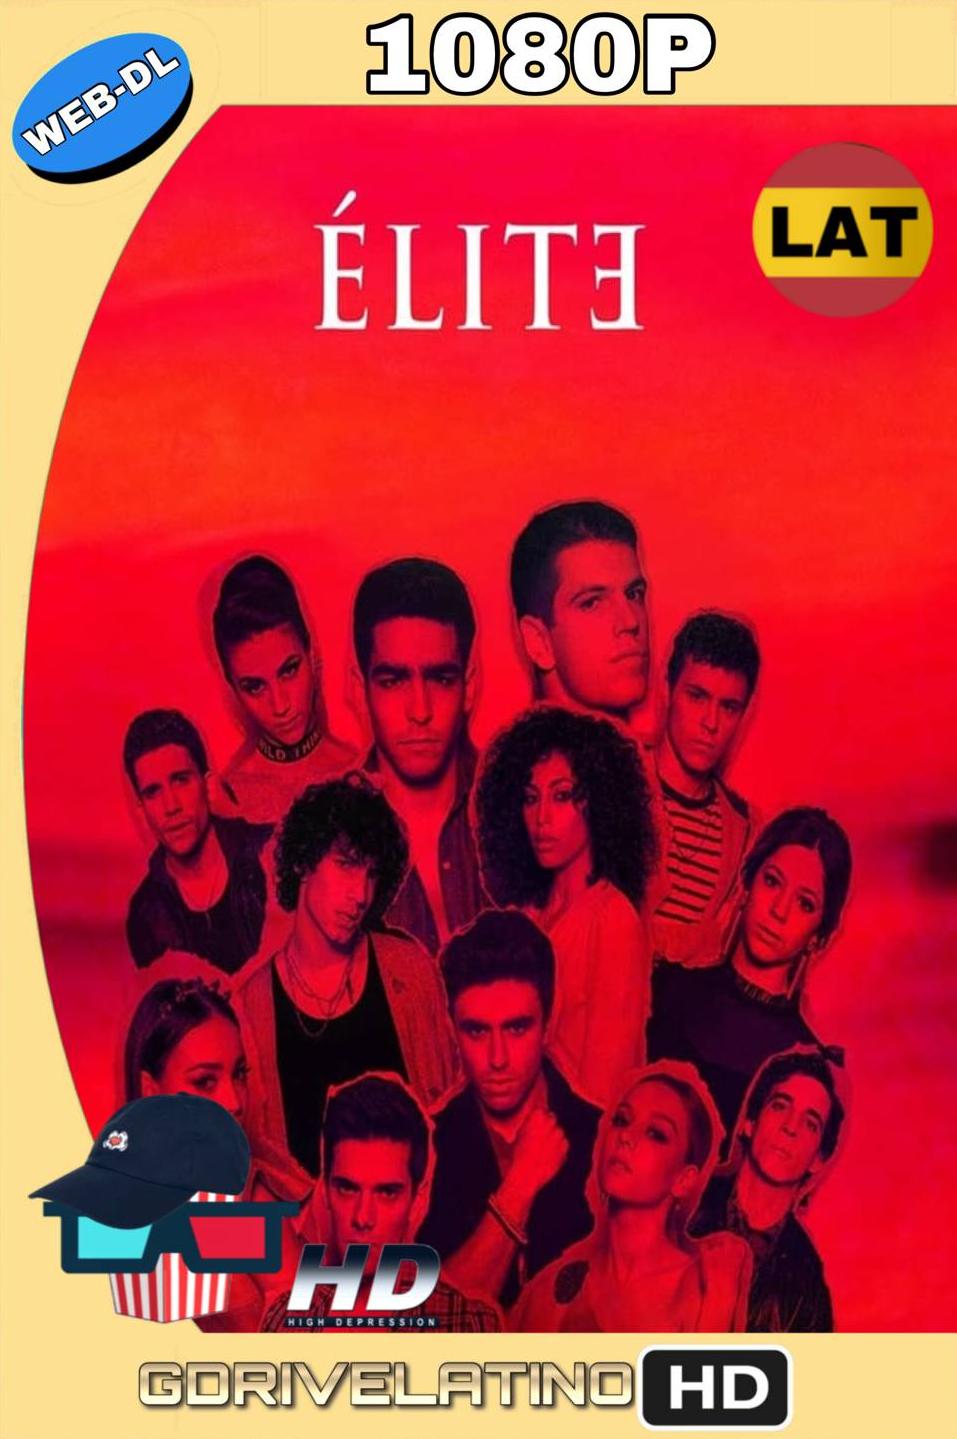 Elite (2019) Temporada 2 NF Web DL 1080P Latino-Castellano MKV